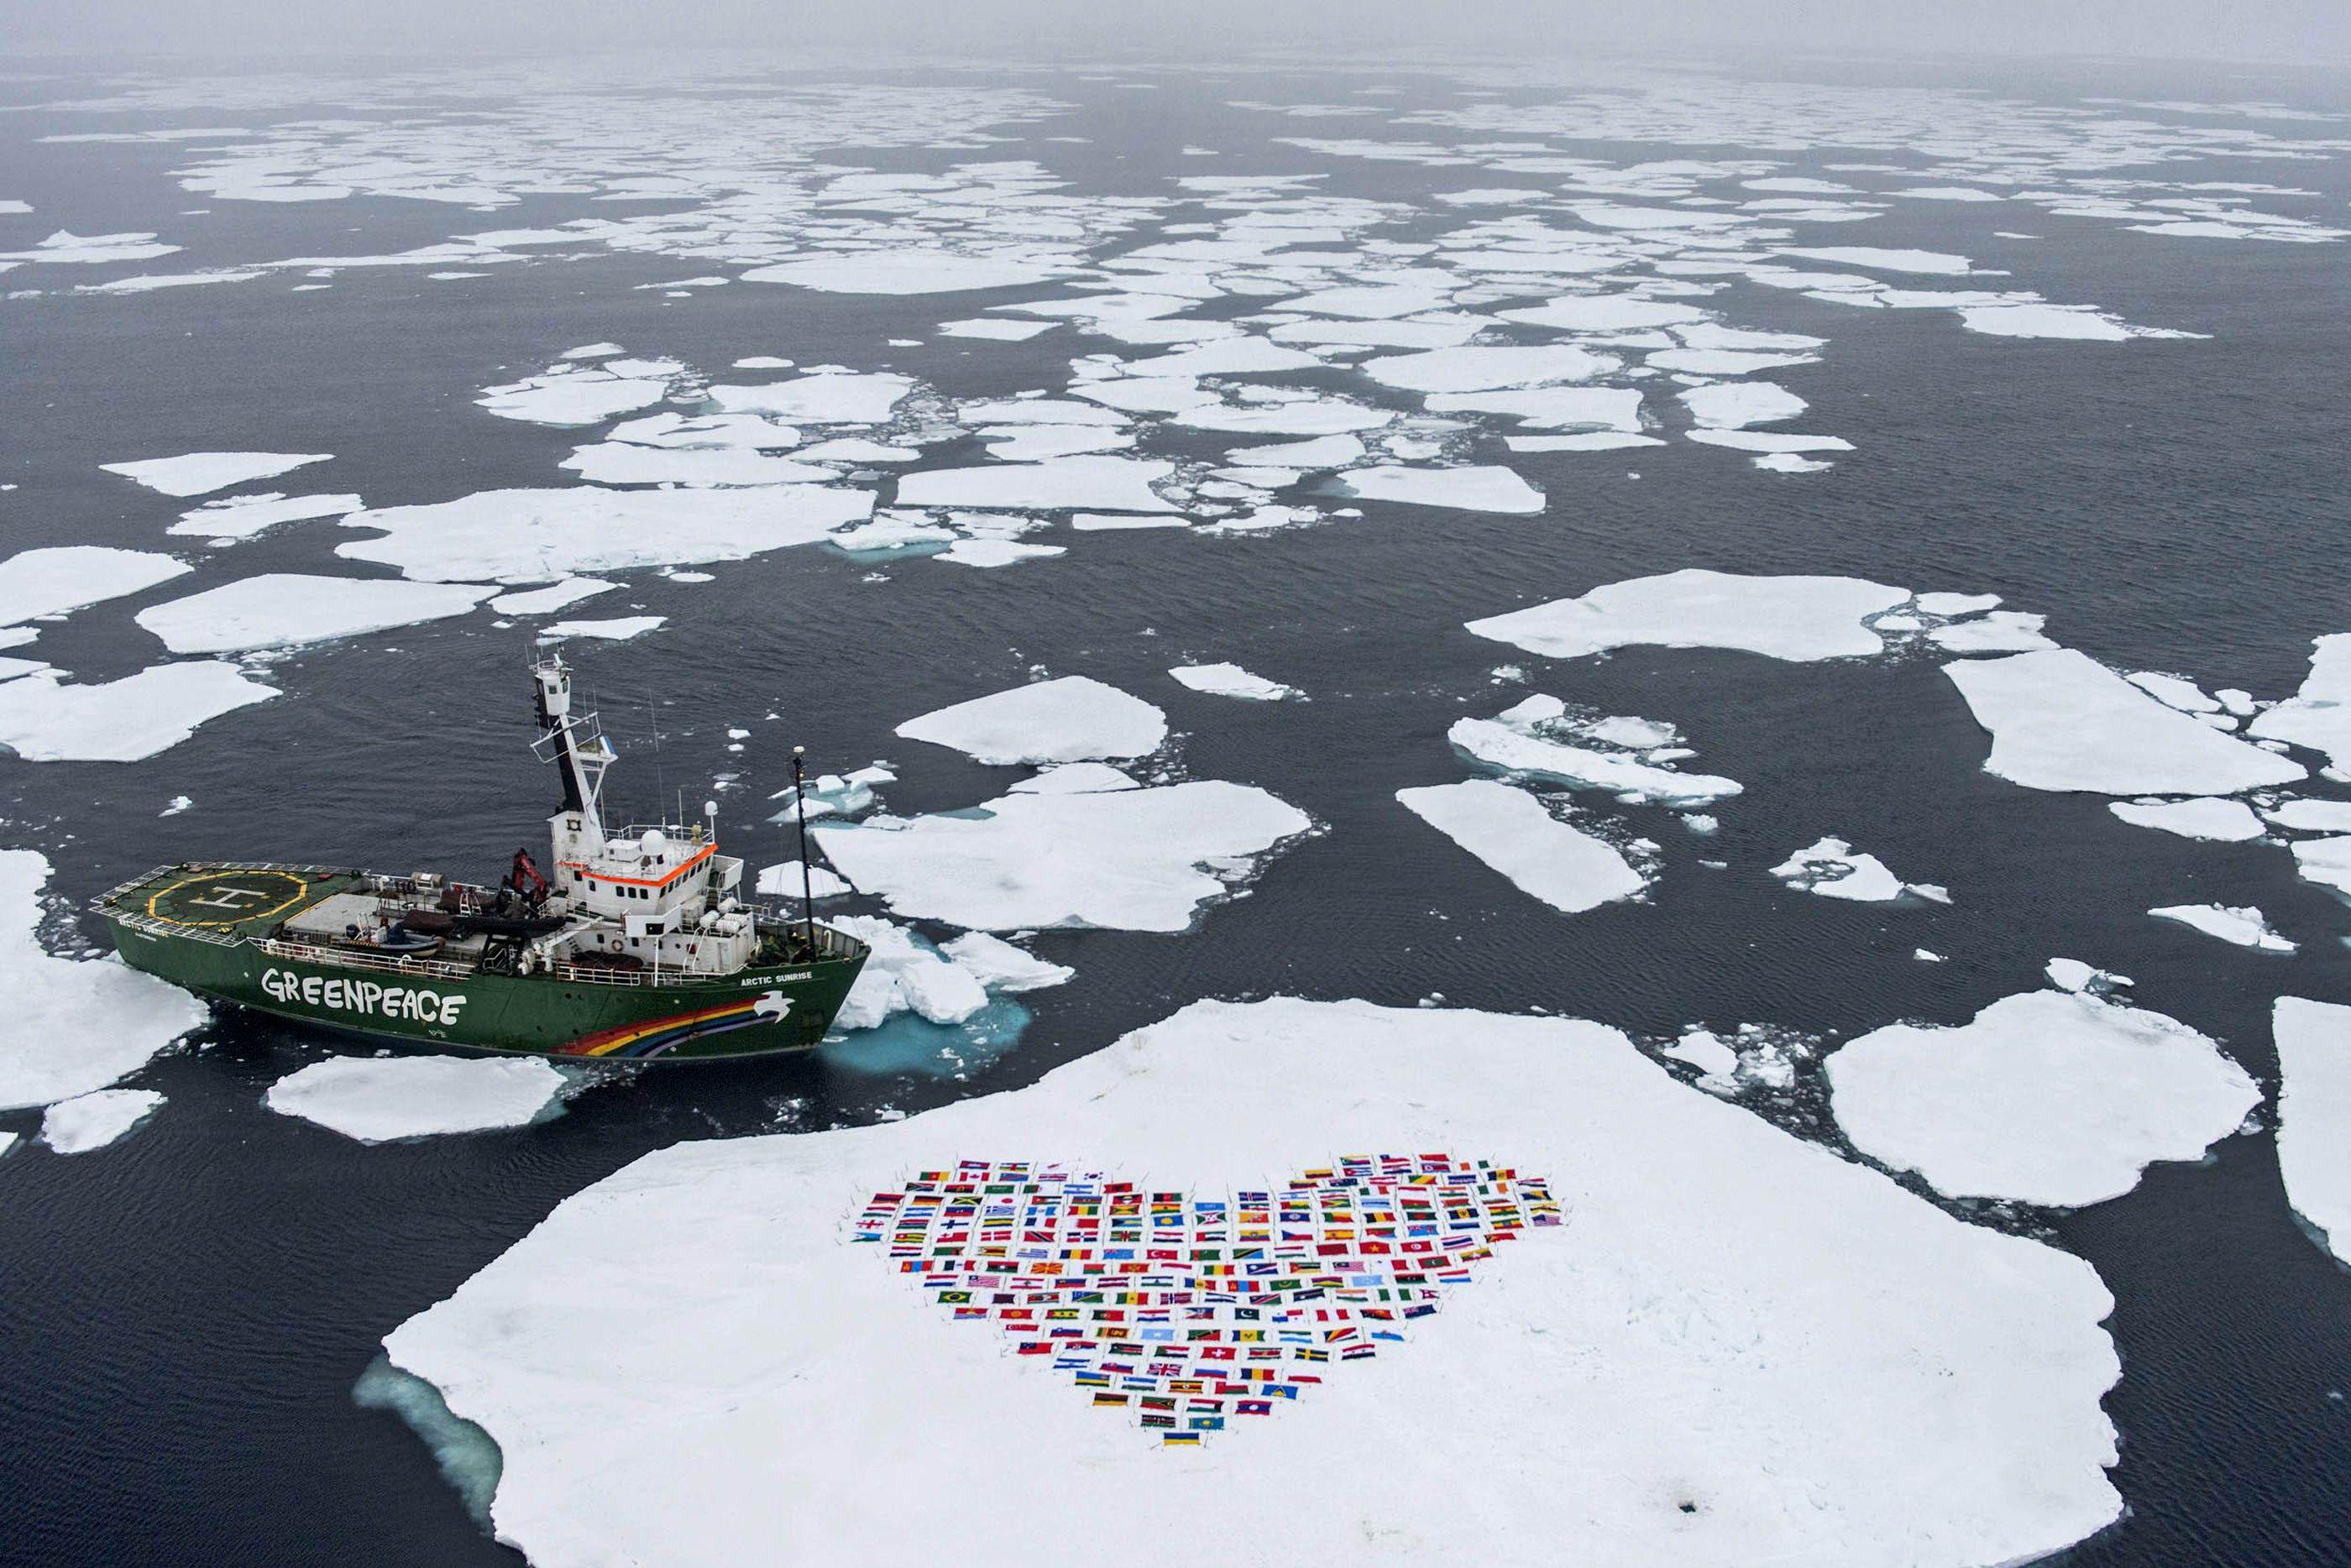 arctic-ocean-greenpeace-heart_gre01_31416721.jpg